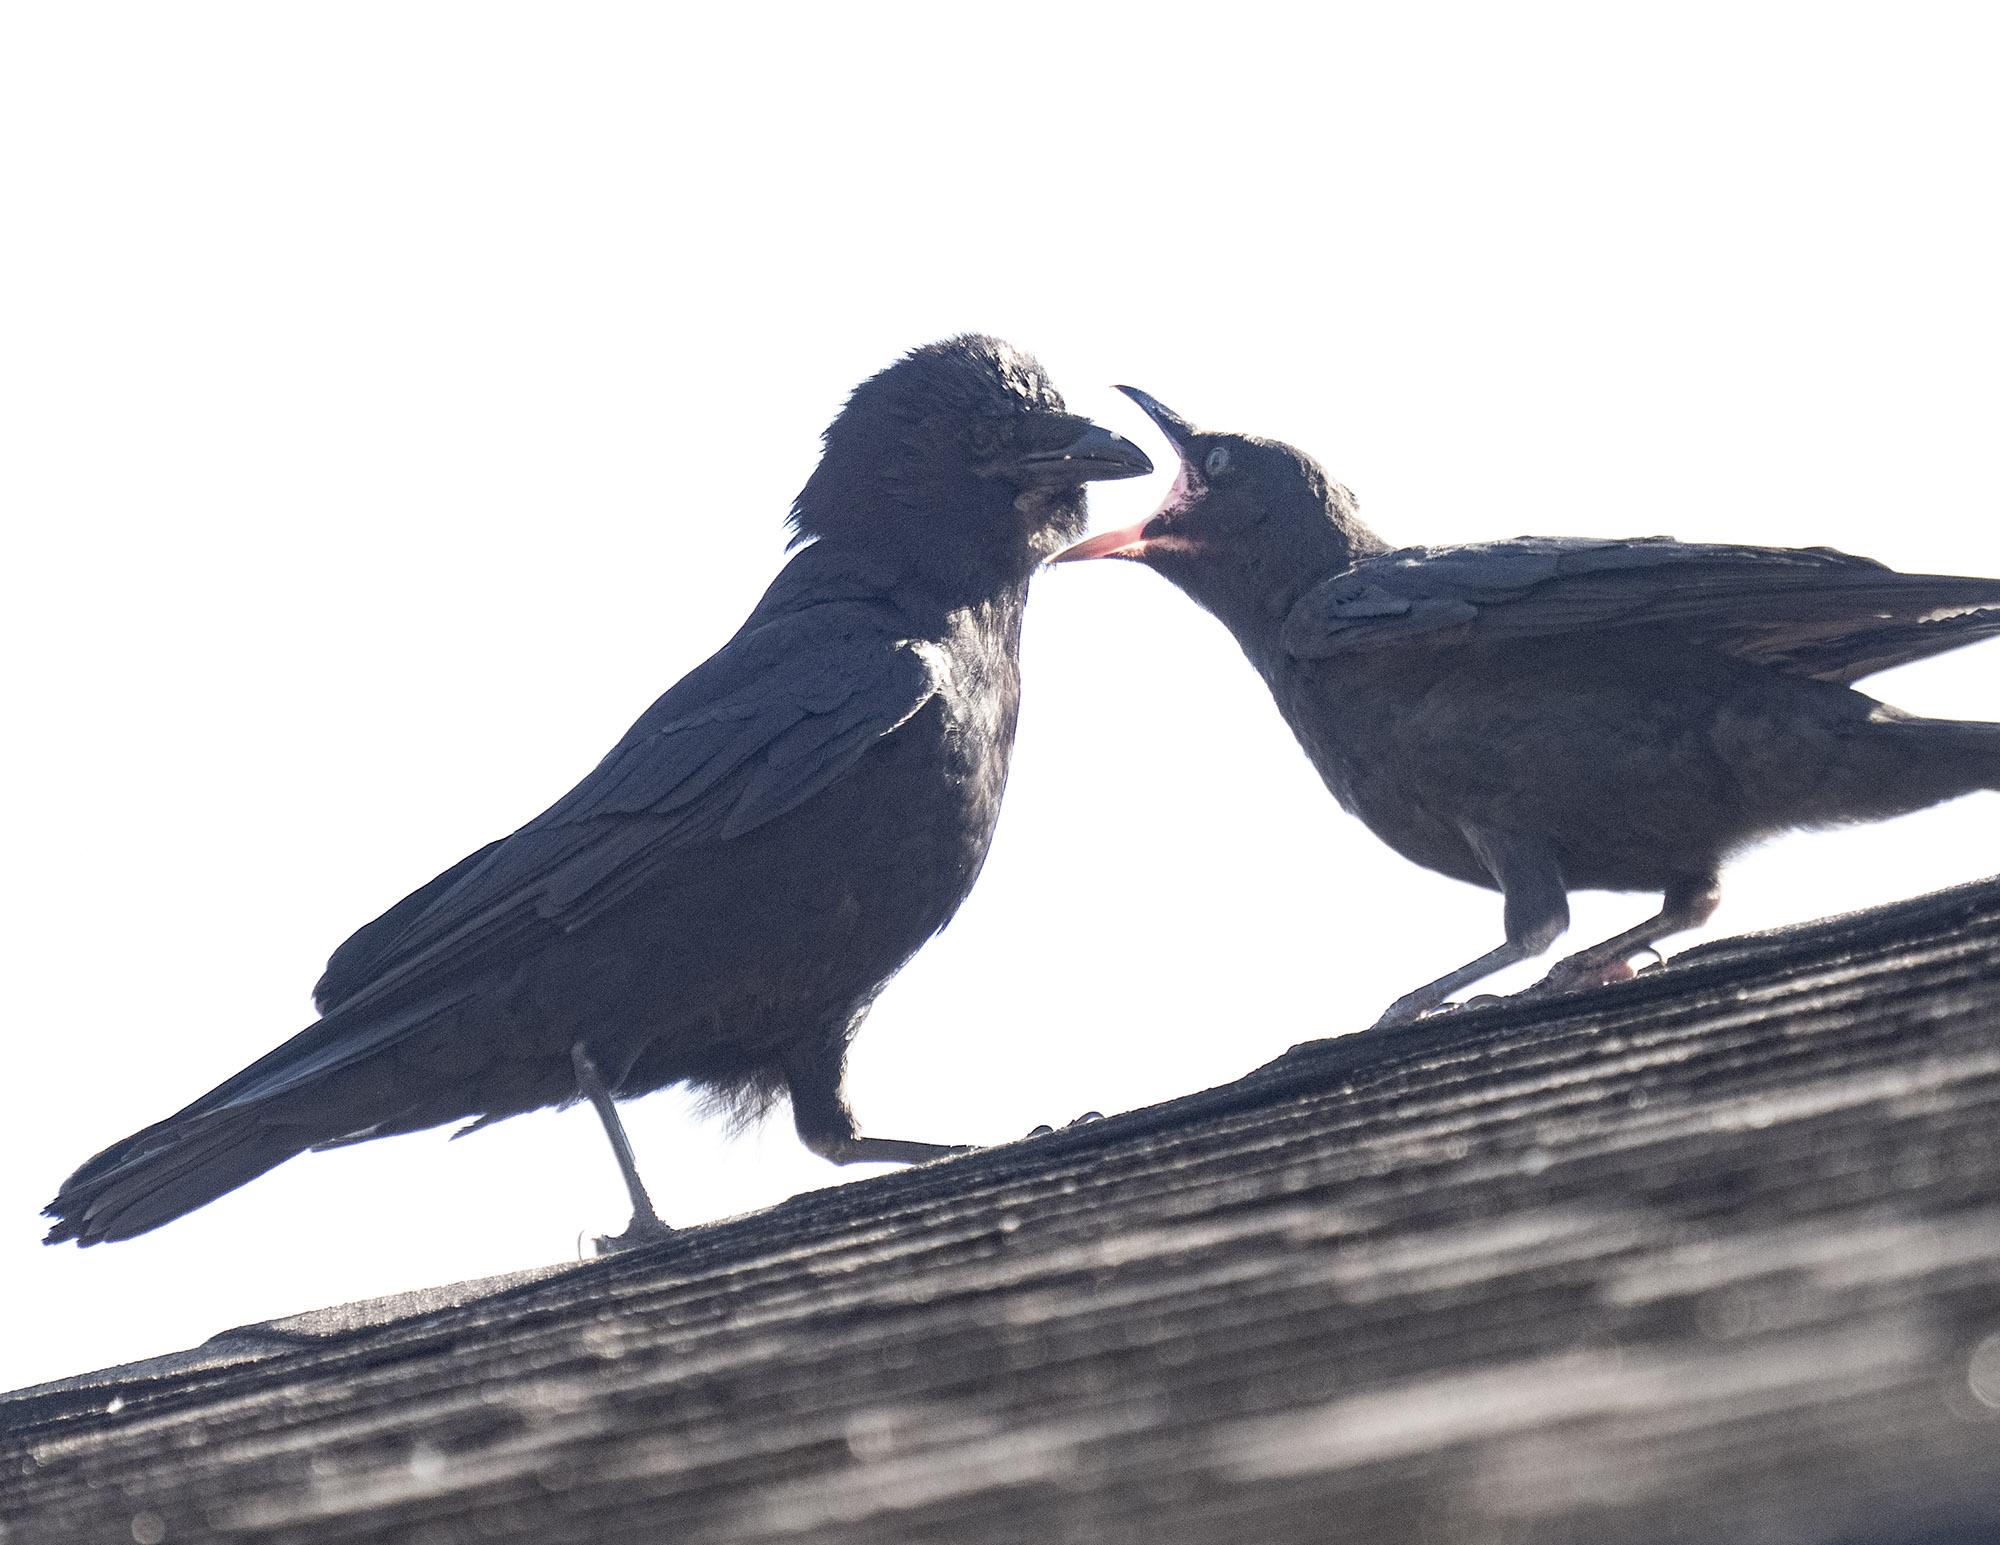 Mabel feeding fledgling Jul 18